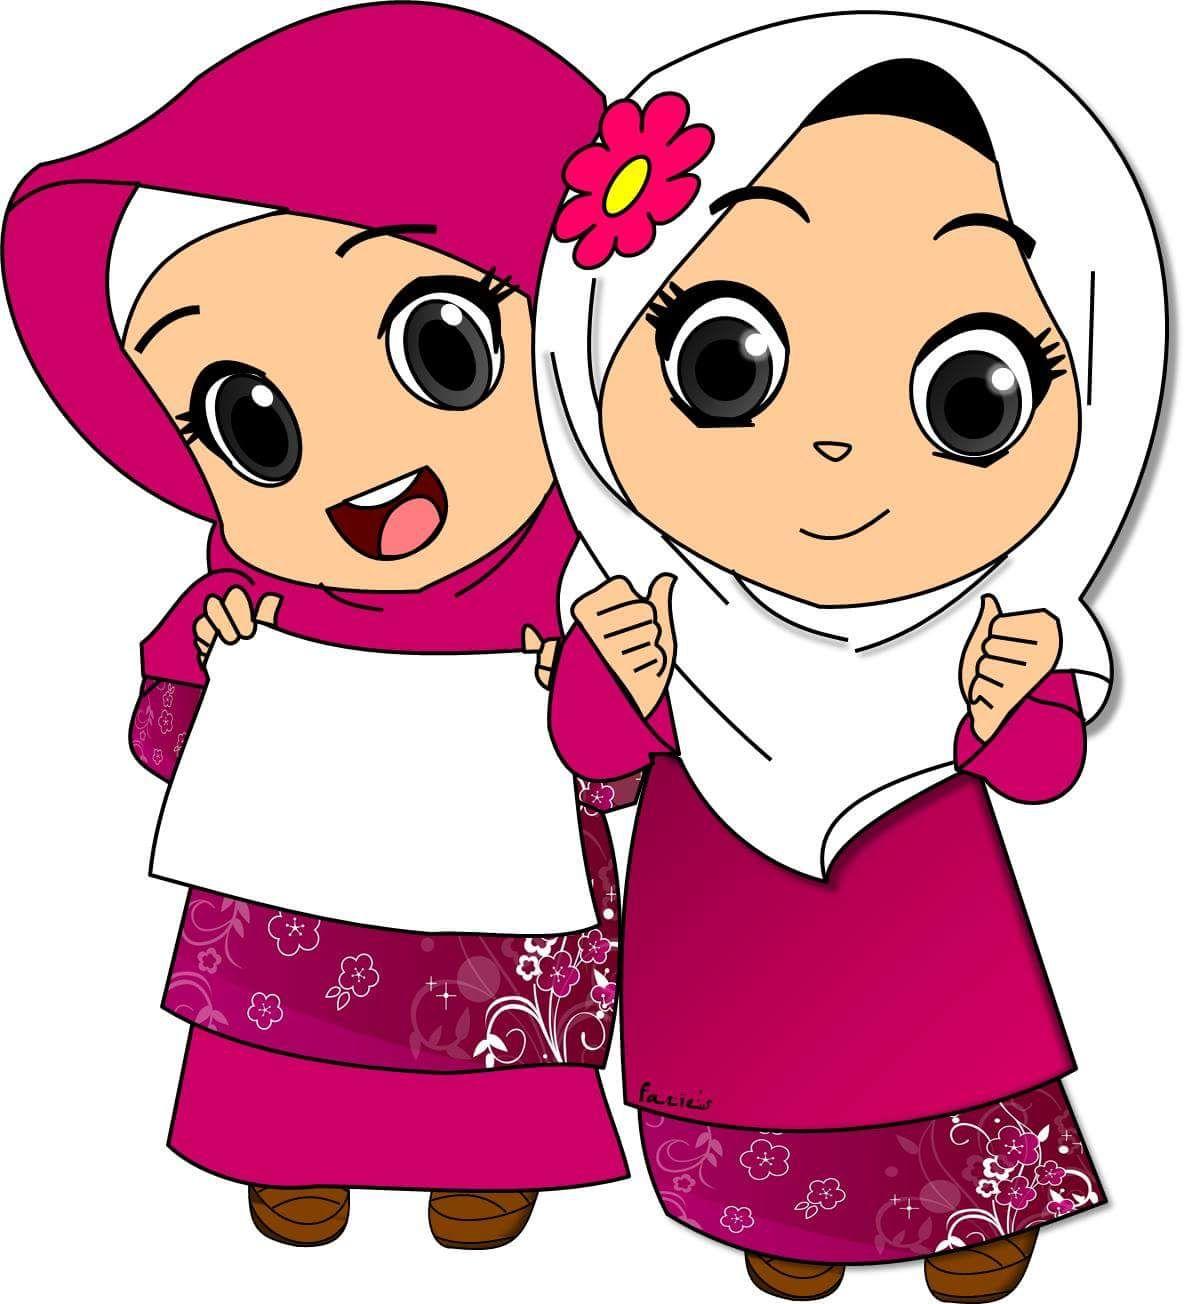 hijab cartoon islam muslim hijabs allah islamic religion spiritual doodles plants